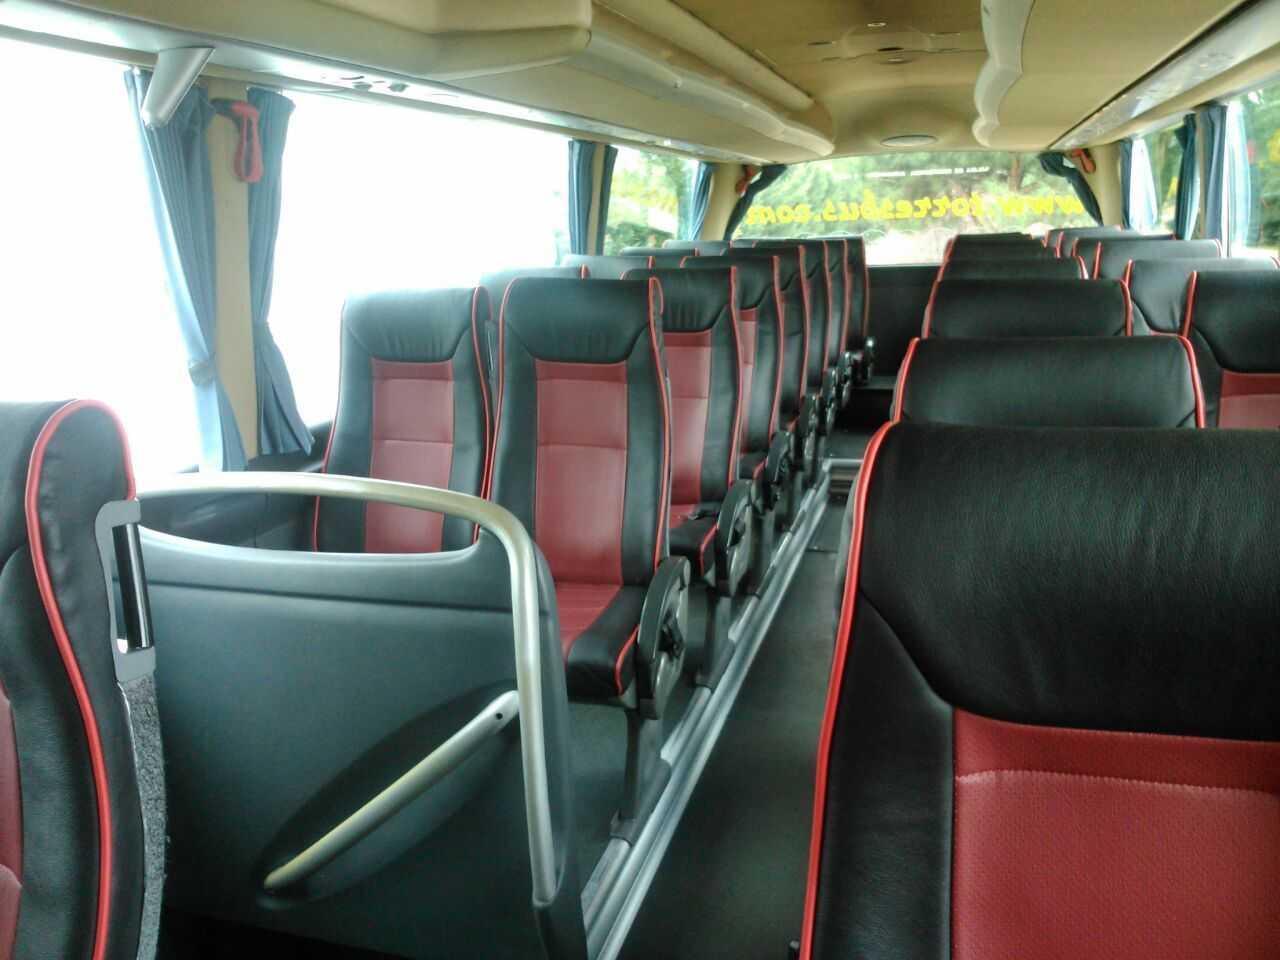 Alquiler de autobús: ¿qué comodidades podemos esperar?